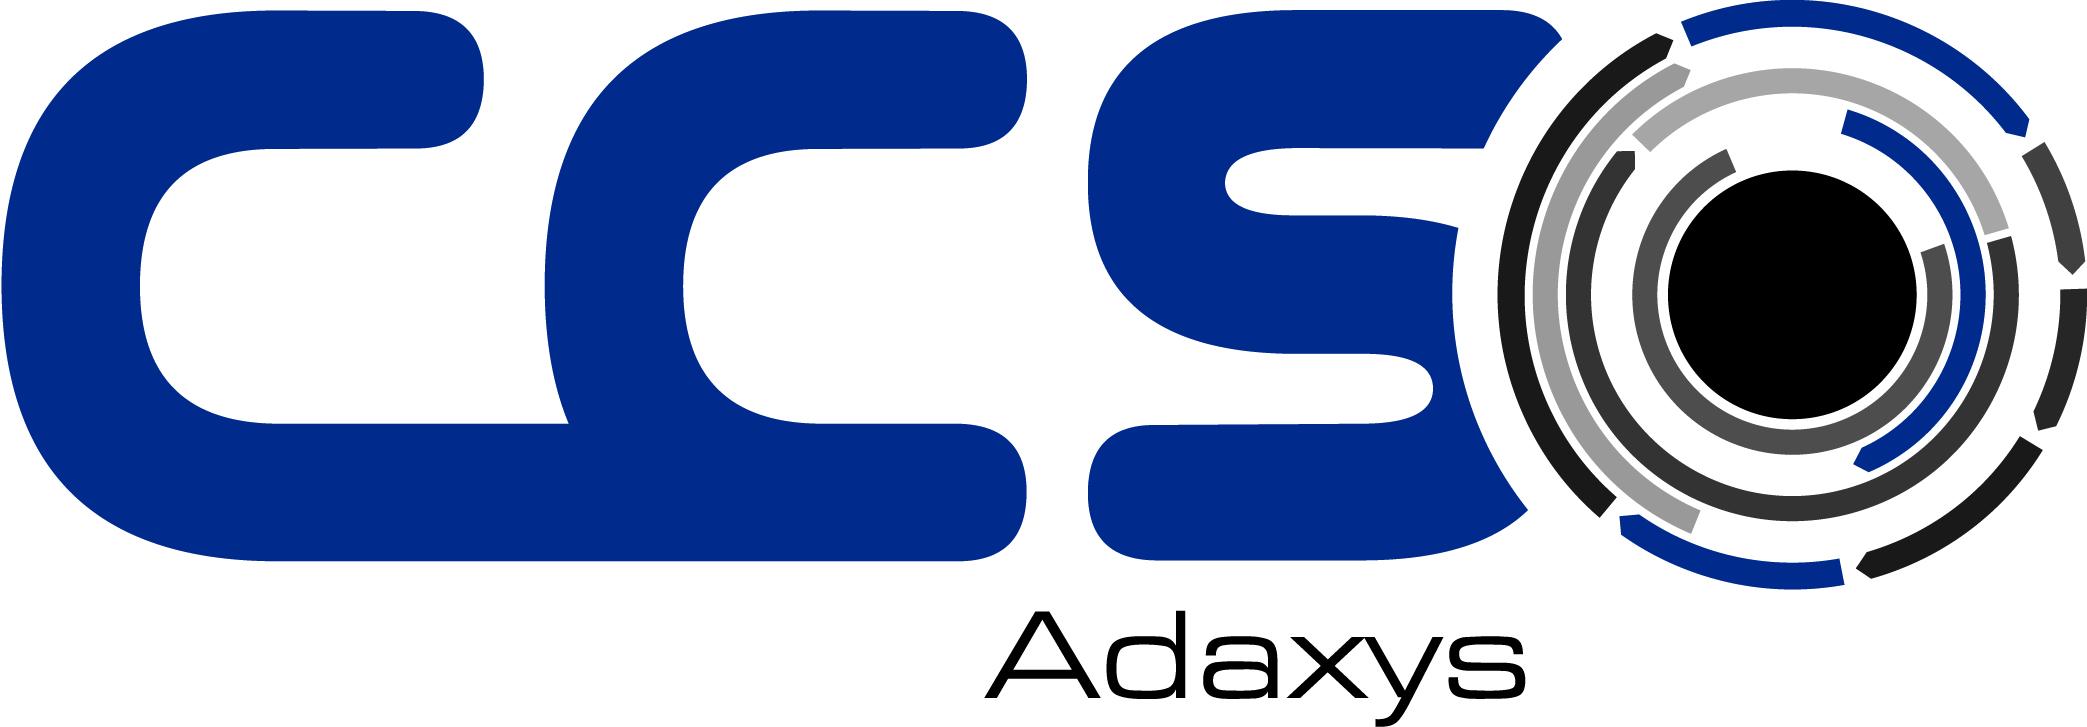 CCS Adaxys AG